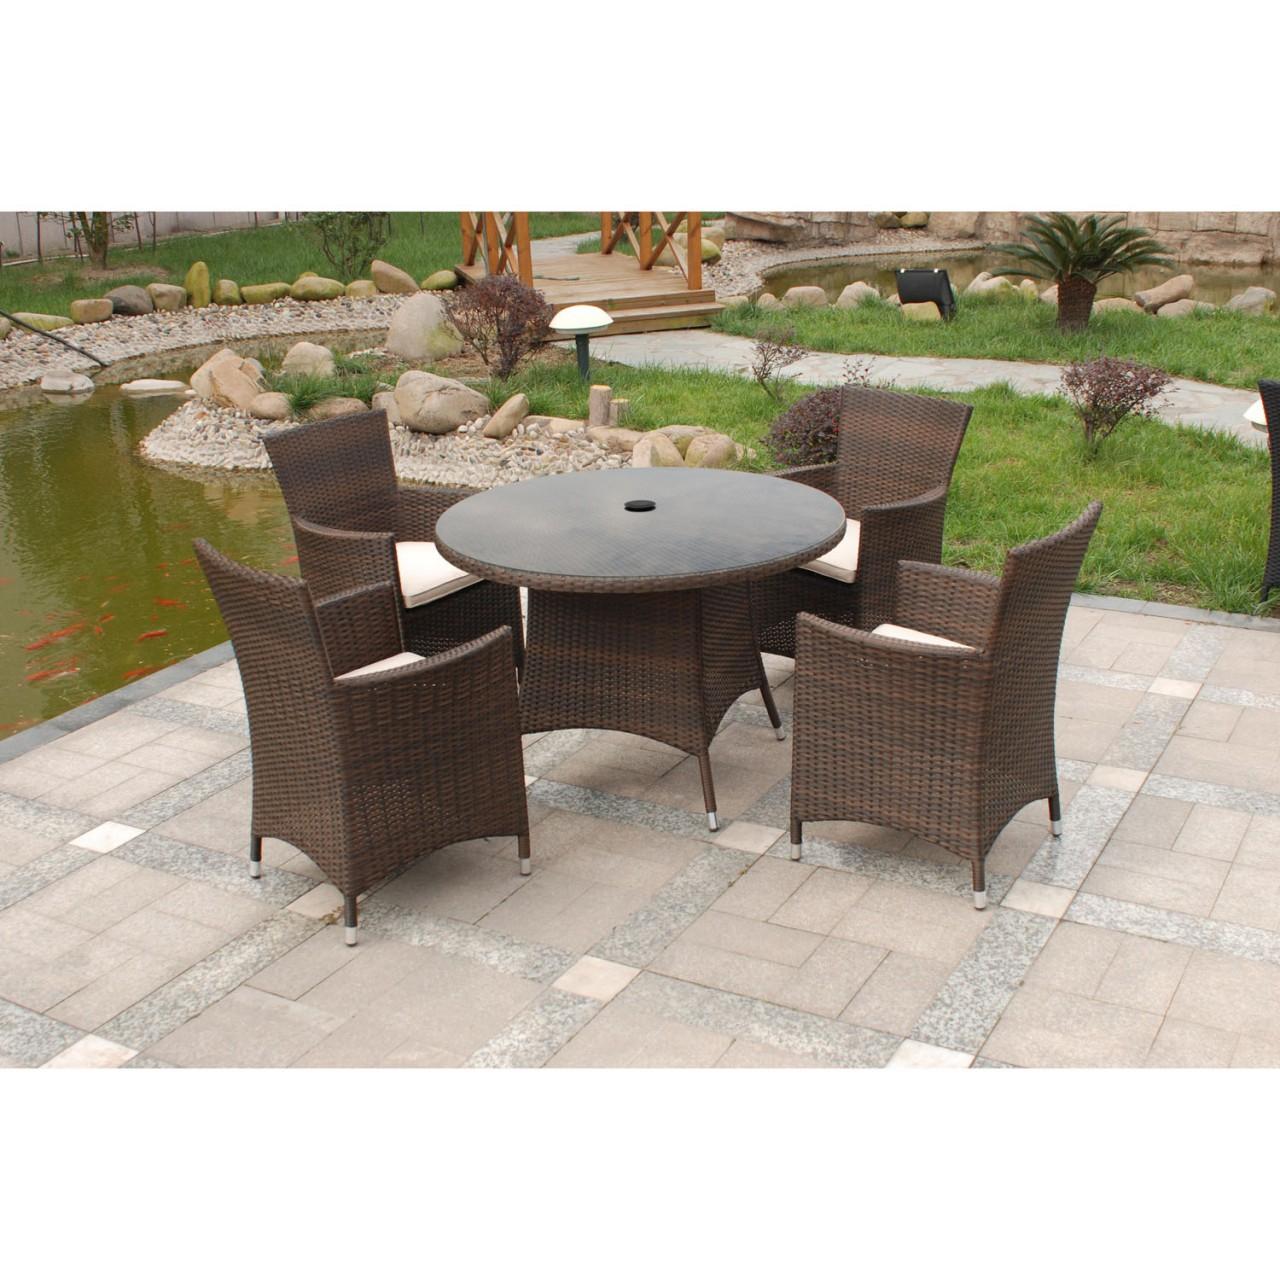 Plastic Rattan Garden Furniture Cozy Outdoor Wicker Patio in dimensions 1280 X 1280